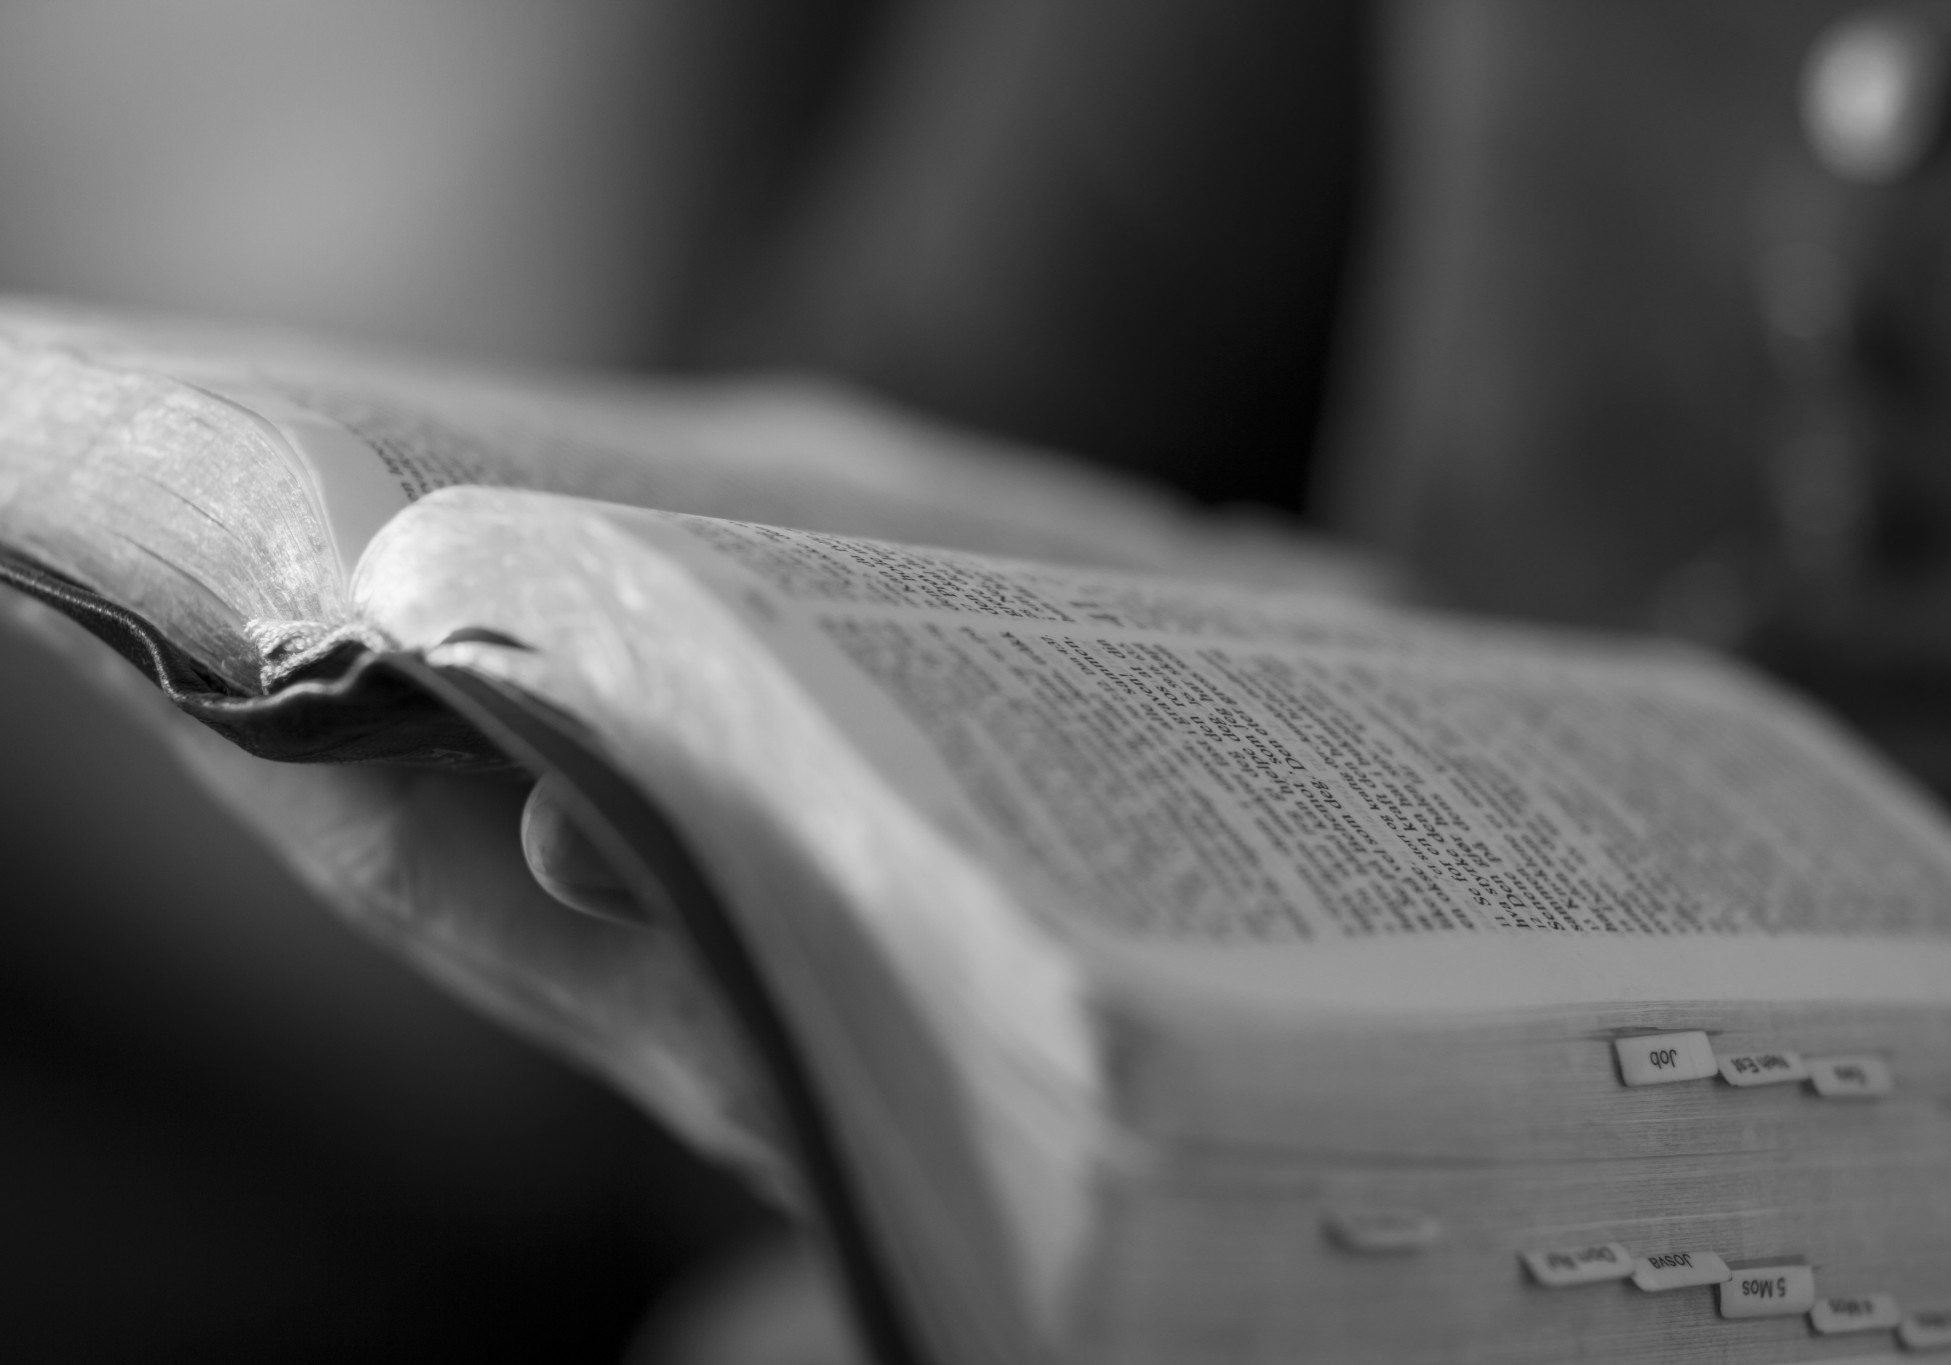 bigstock-Woman-reading-the-Bible-60856916